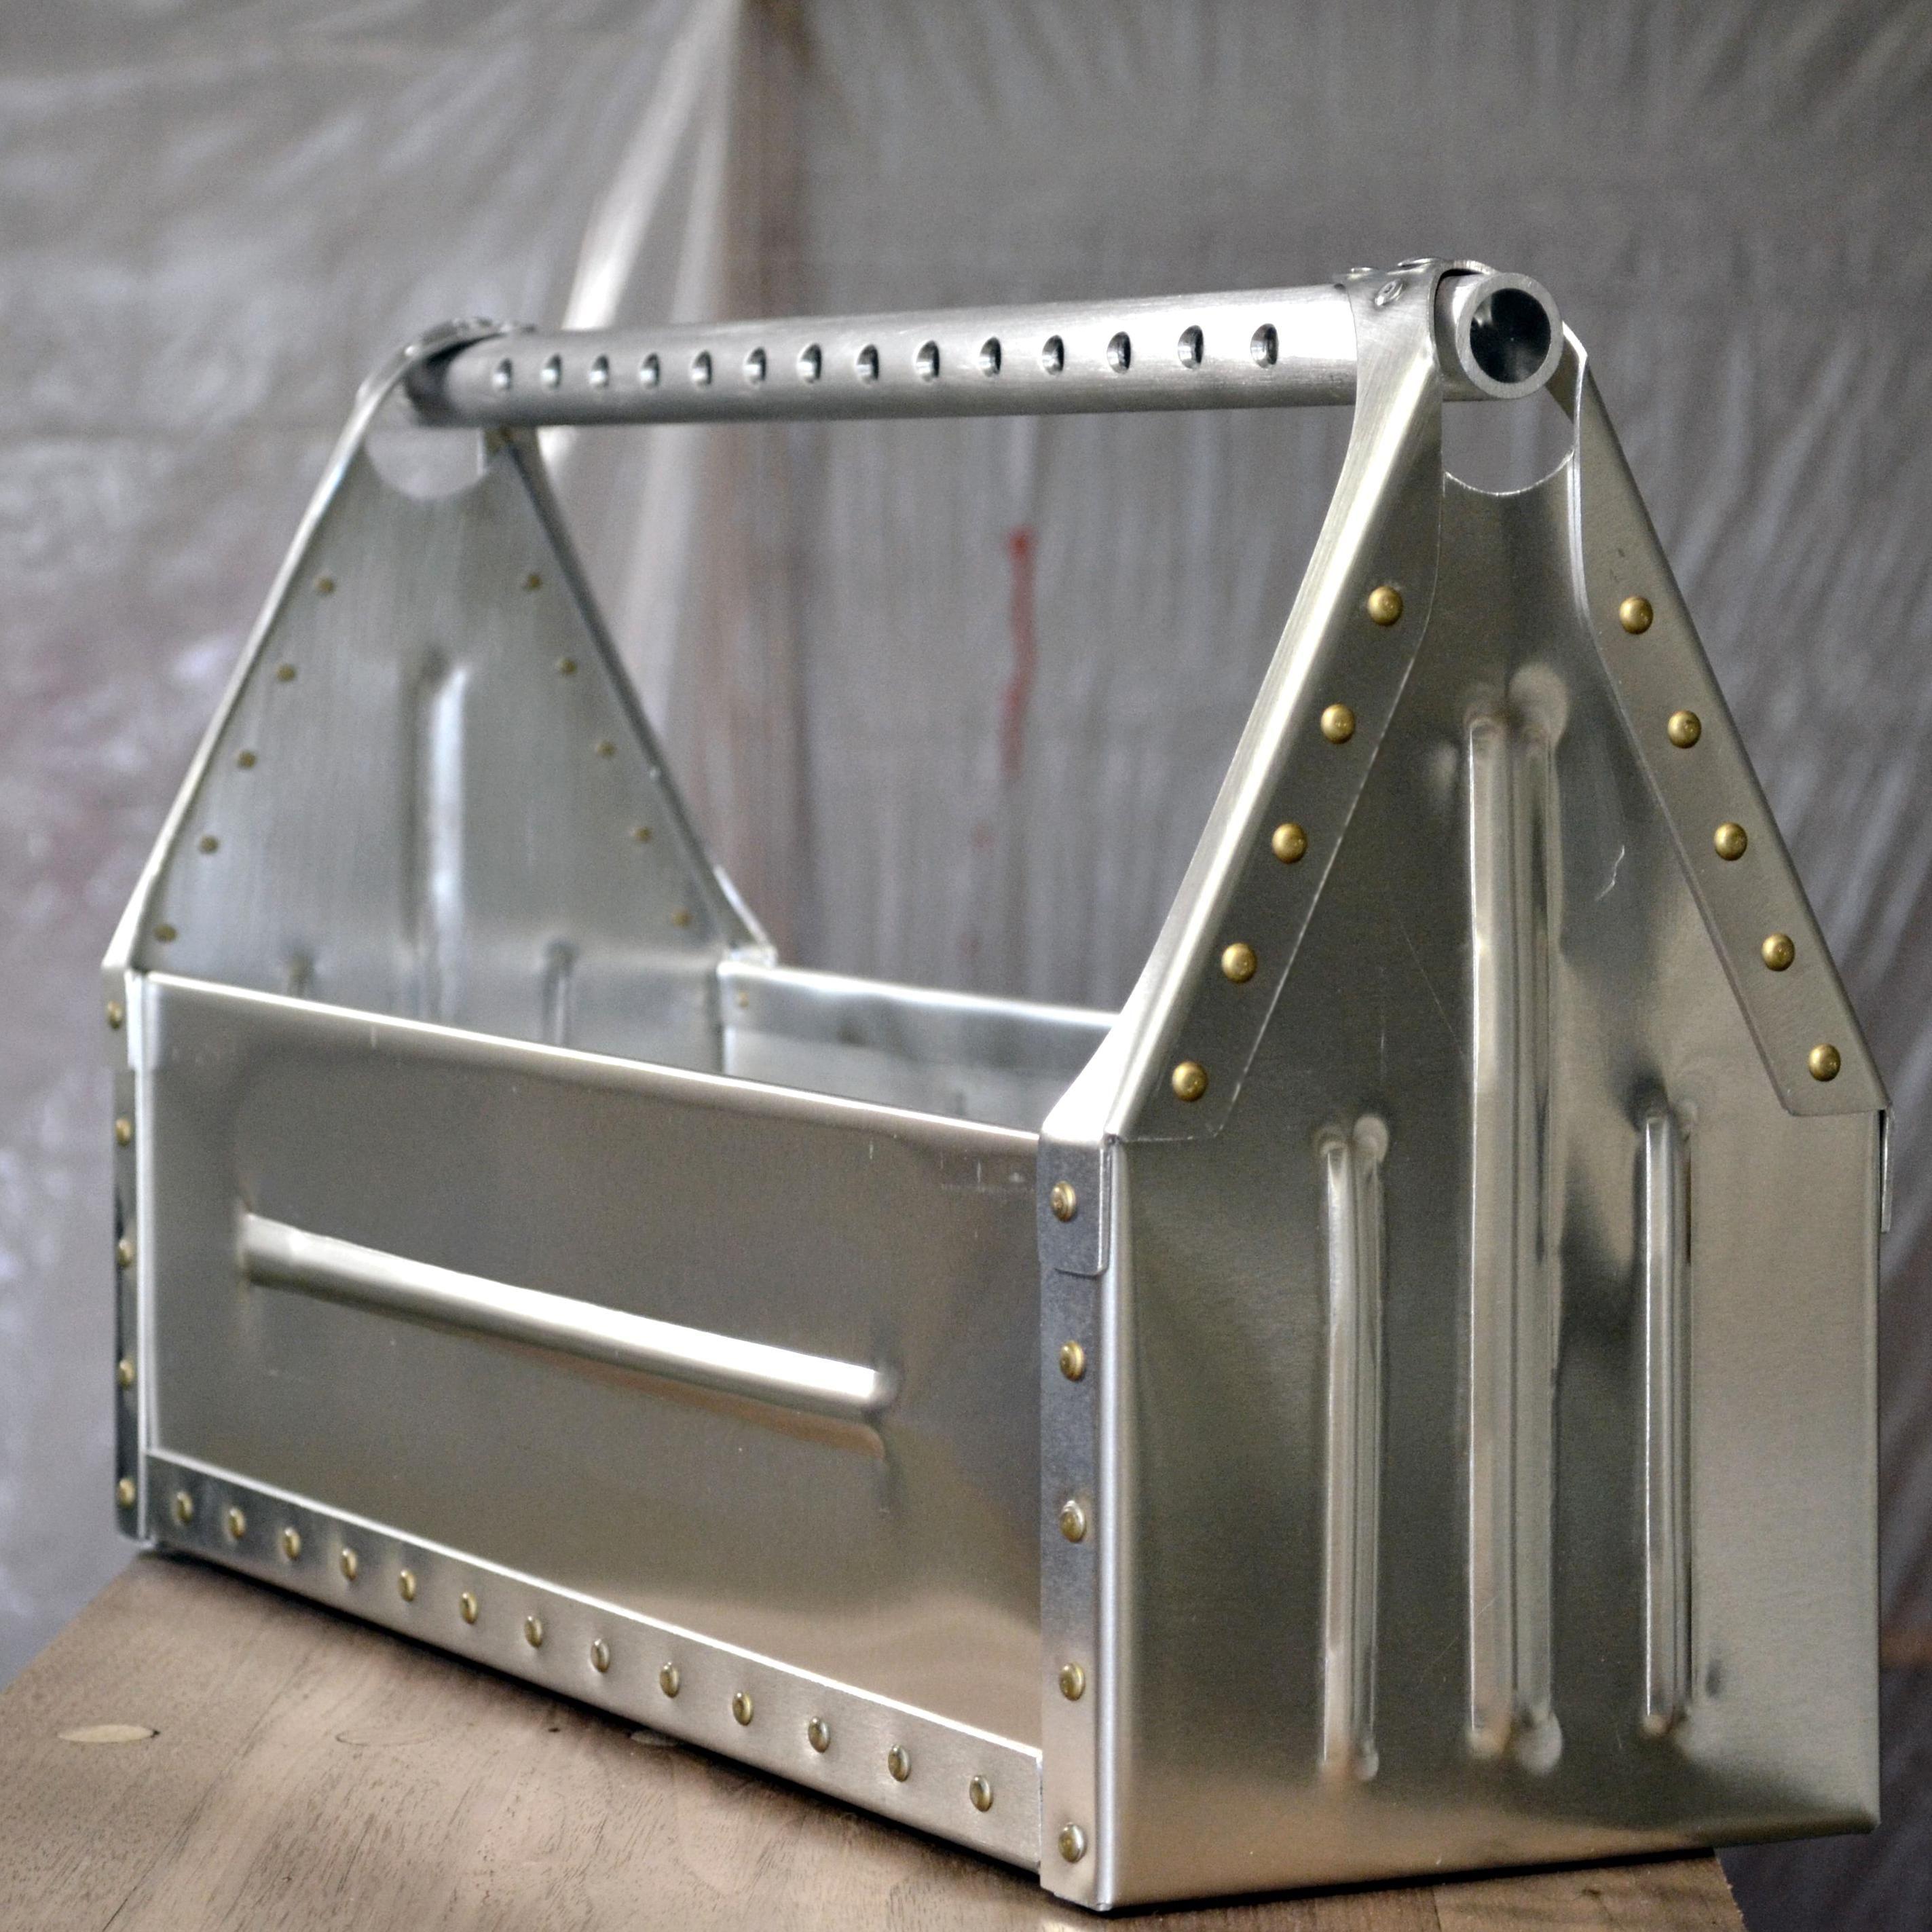 Aluminum Sheet Metal Toolbox Aircraft Rivets Cross Drilled Handle Bead Rolled Panels A Fun Hand In 2020 Sheet Metal Fabrication Aluminum Sheet Metal Sheet Metal Crafts